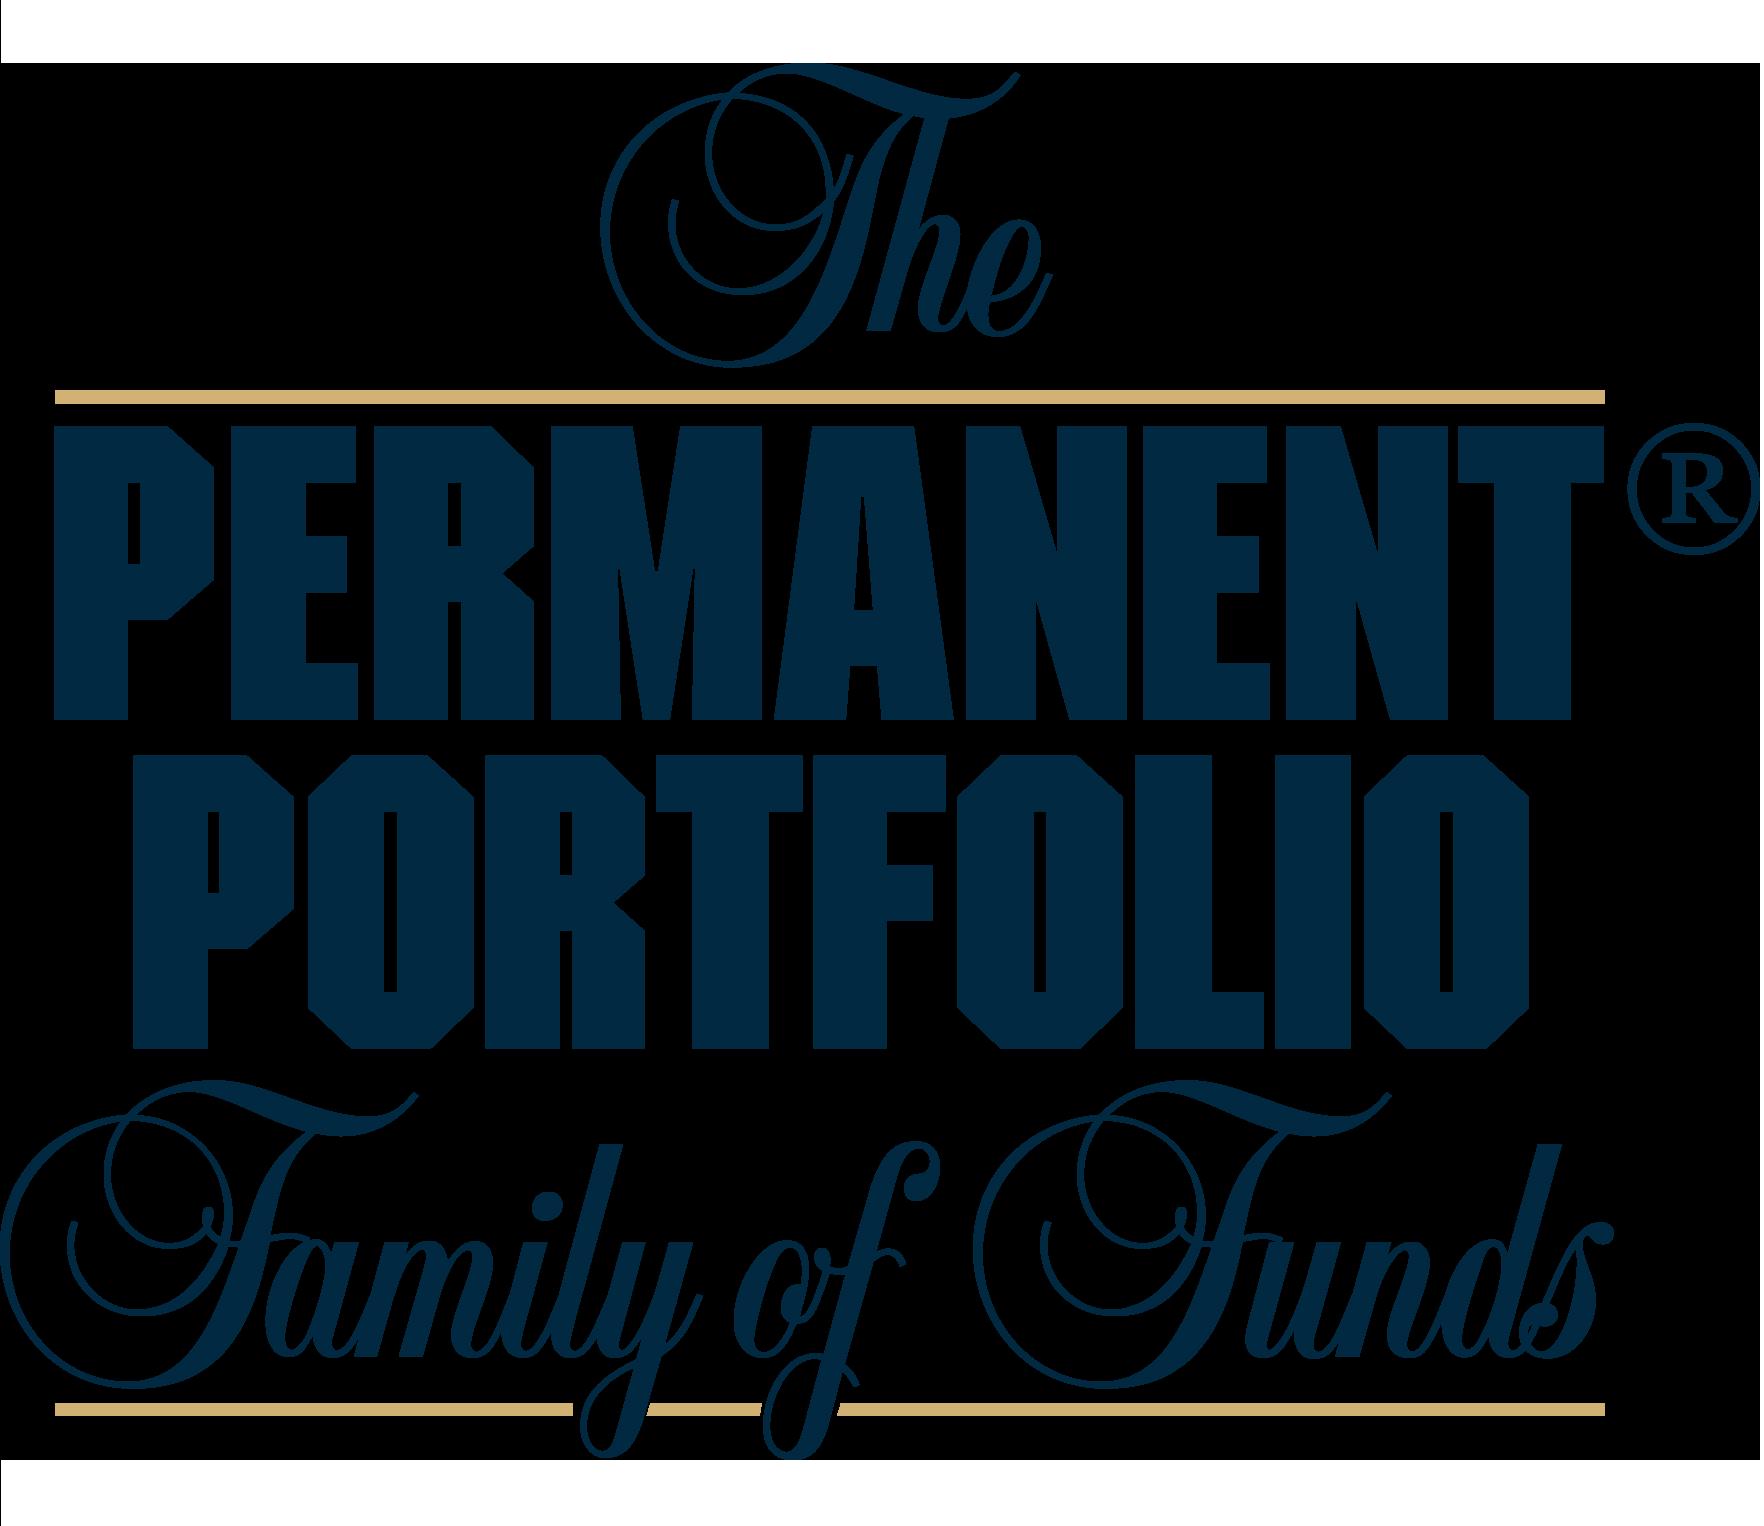 Permanent Portfolio Family of Funds